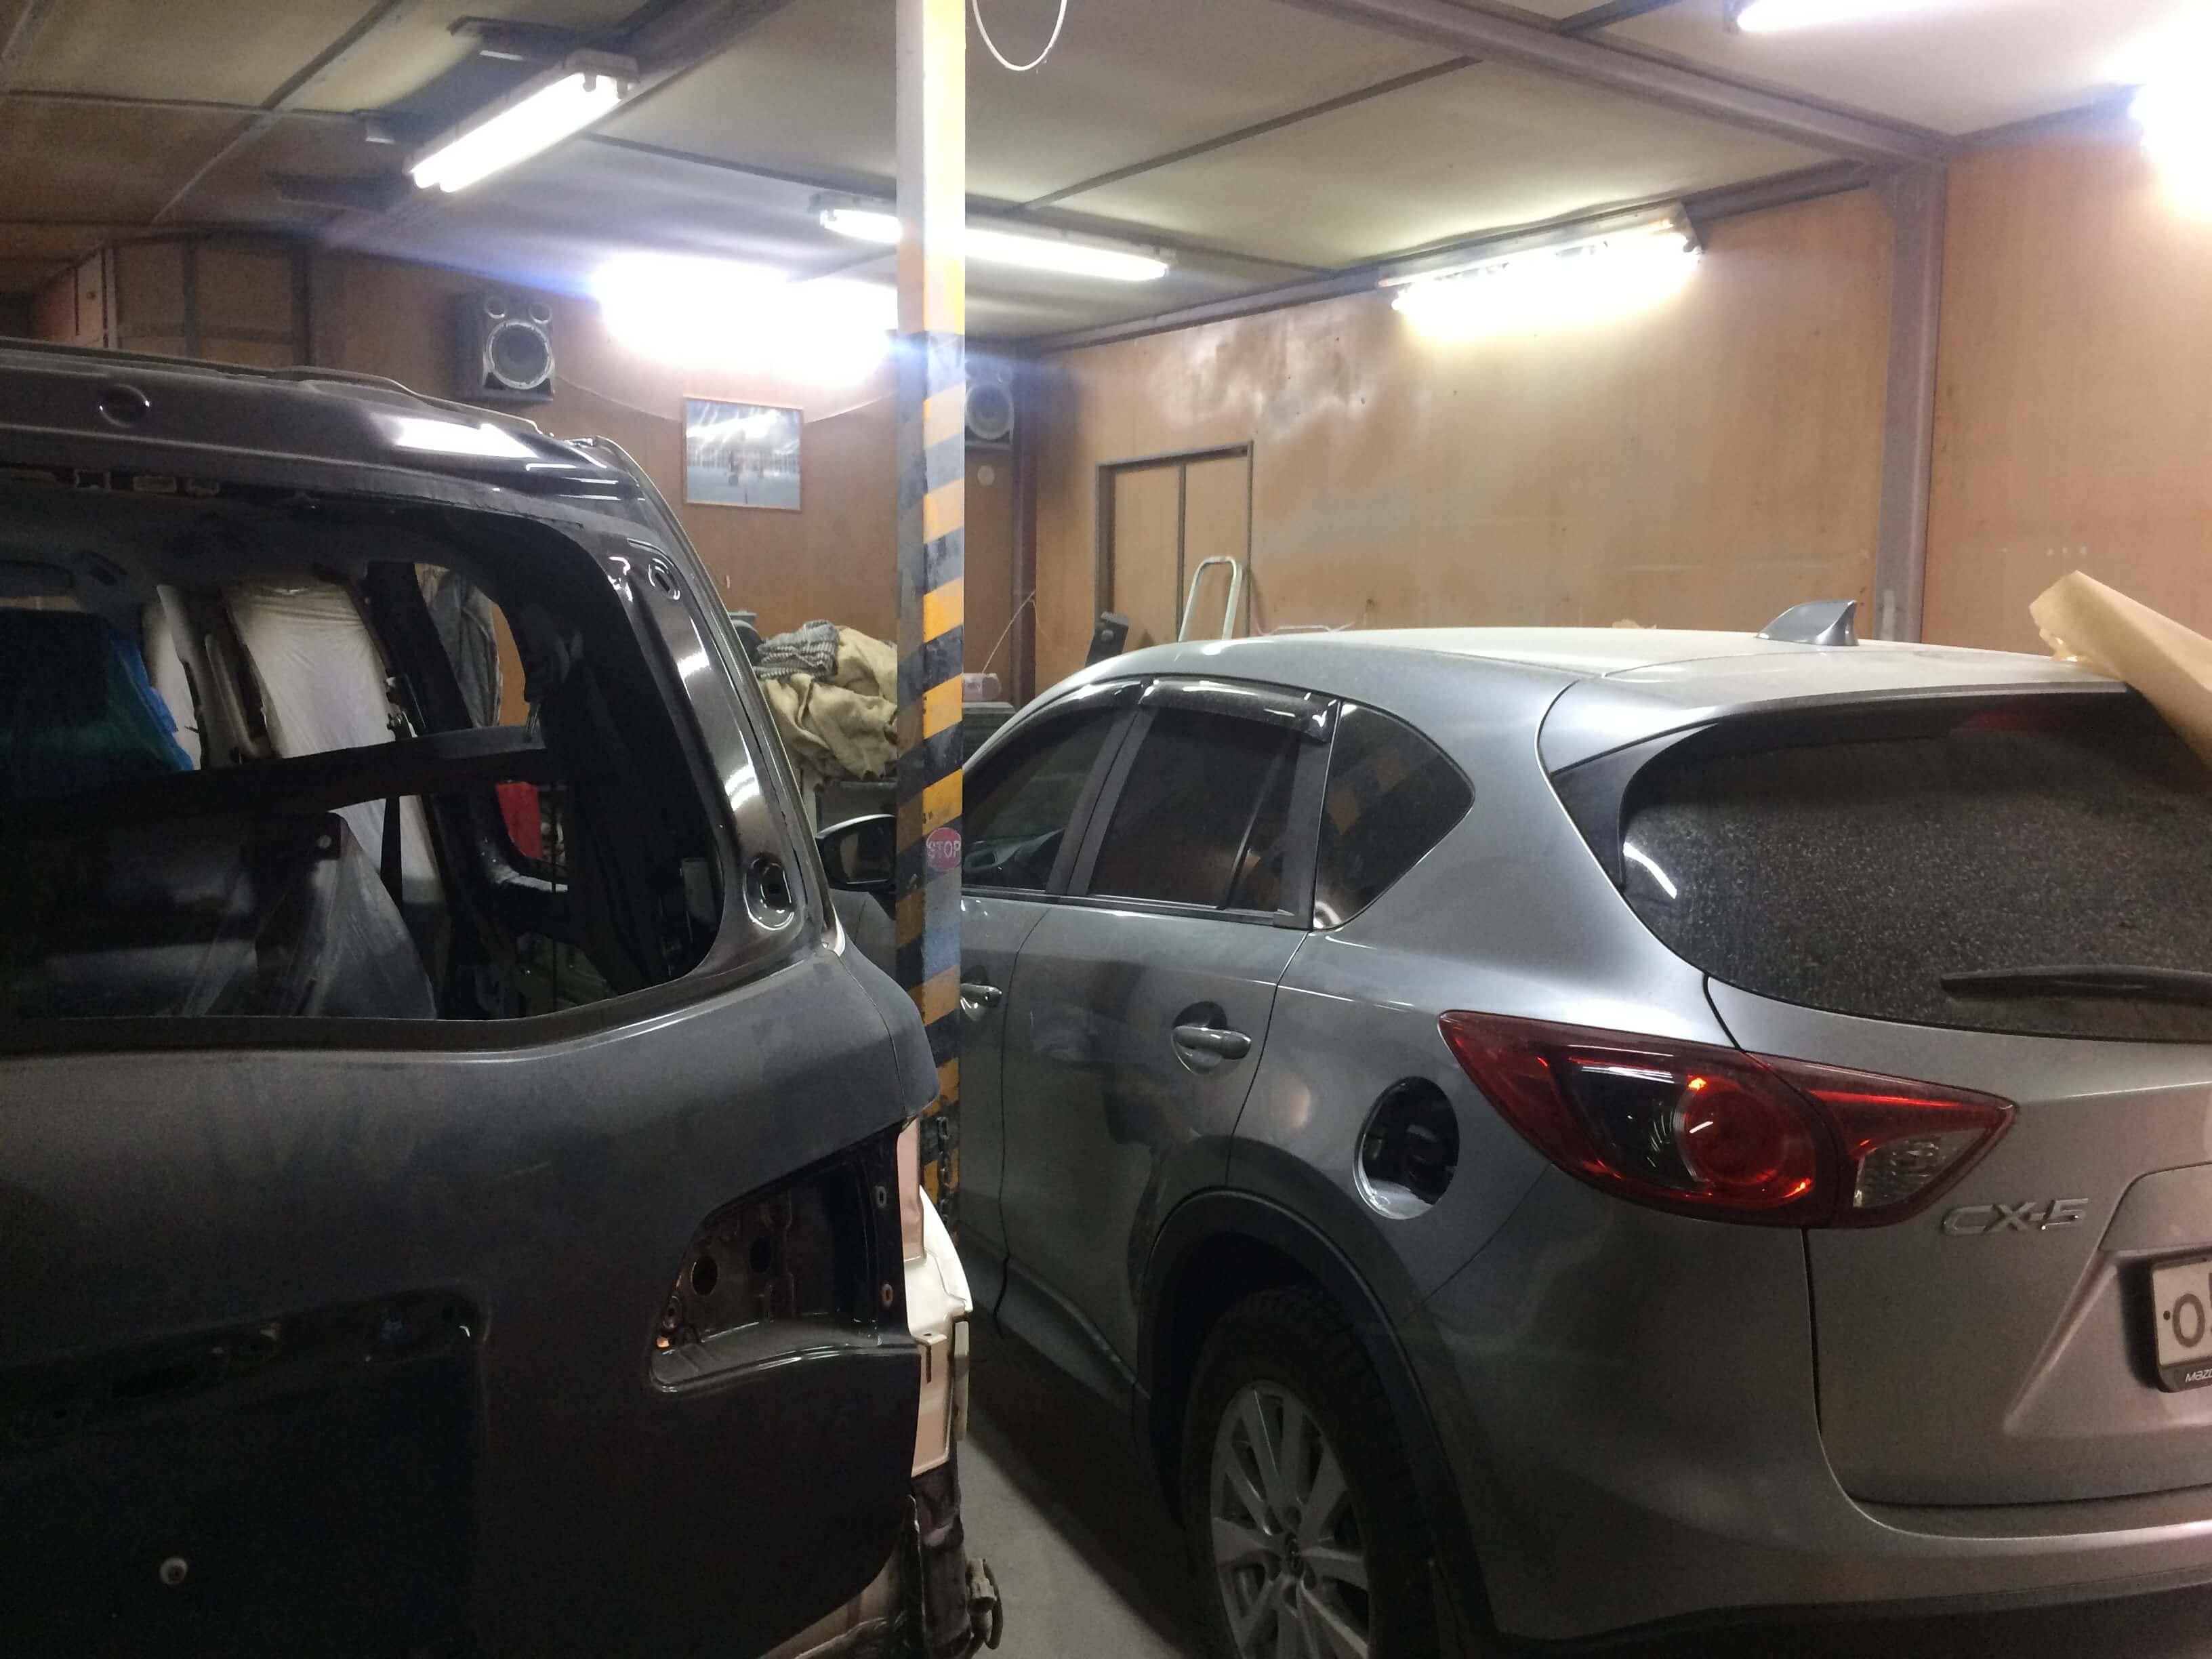 бокс-местоположение-кузовного-ремонта-покраски-plasti-do-краснодар